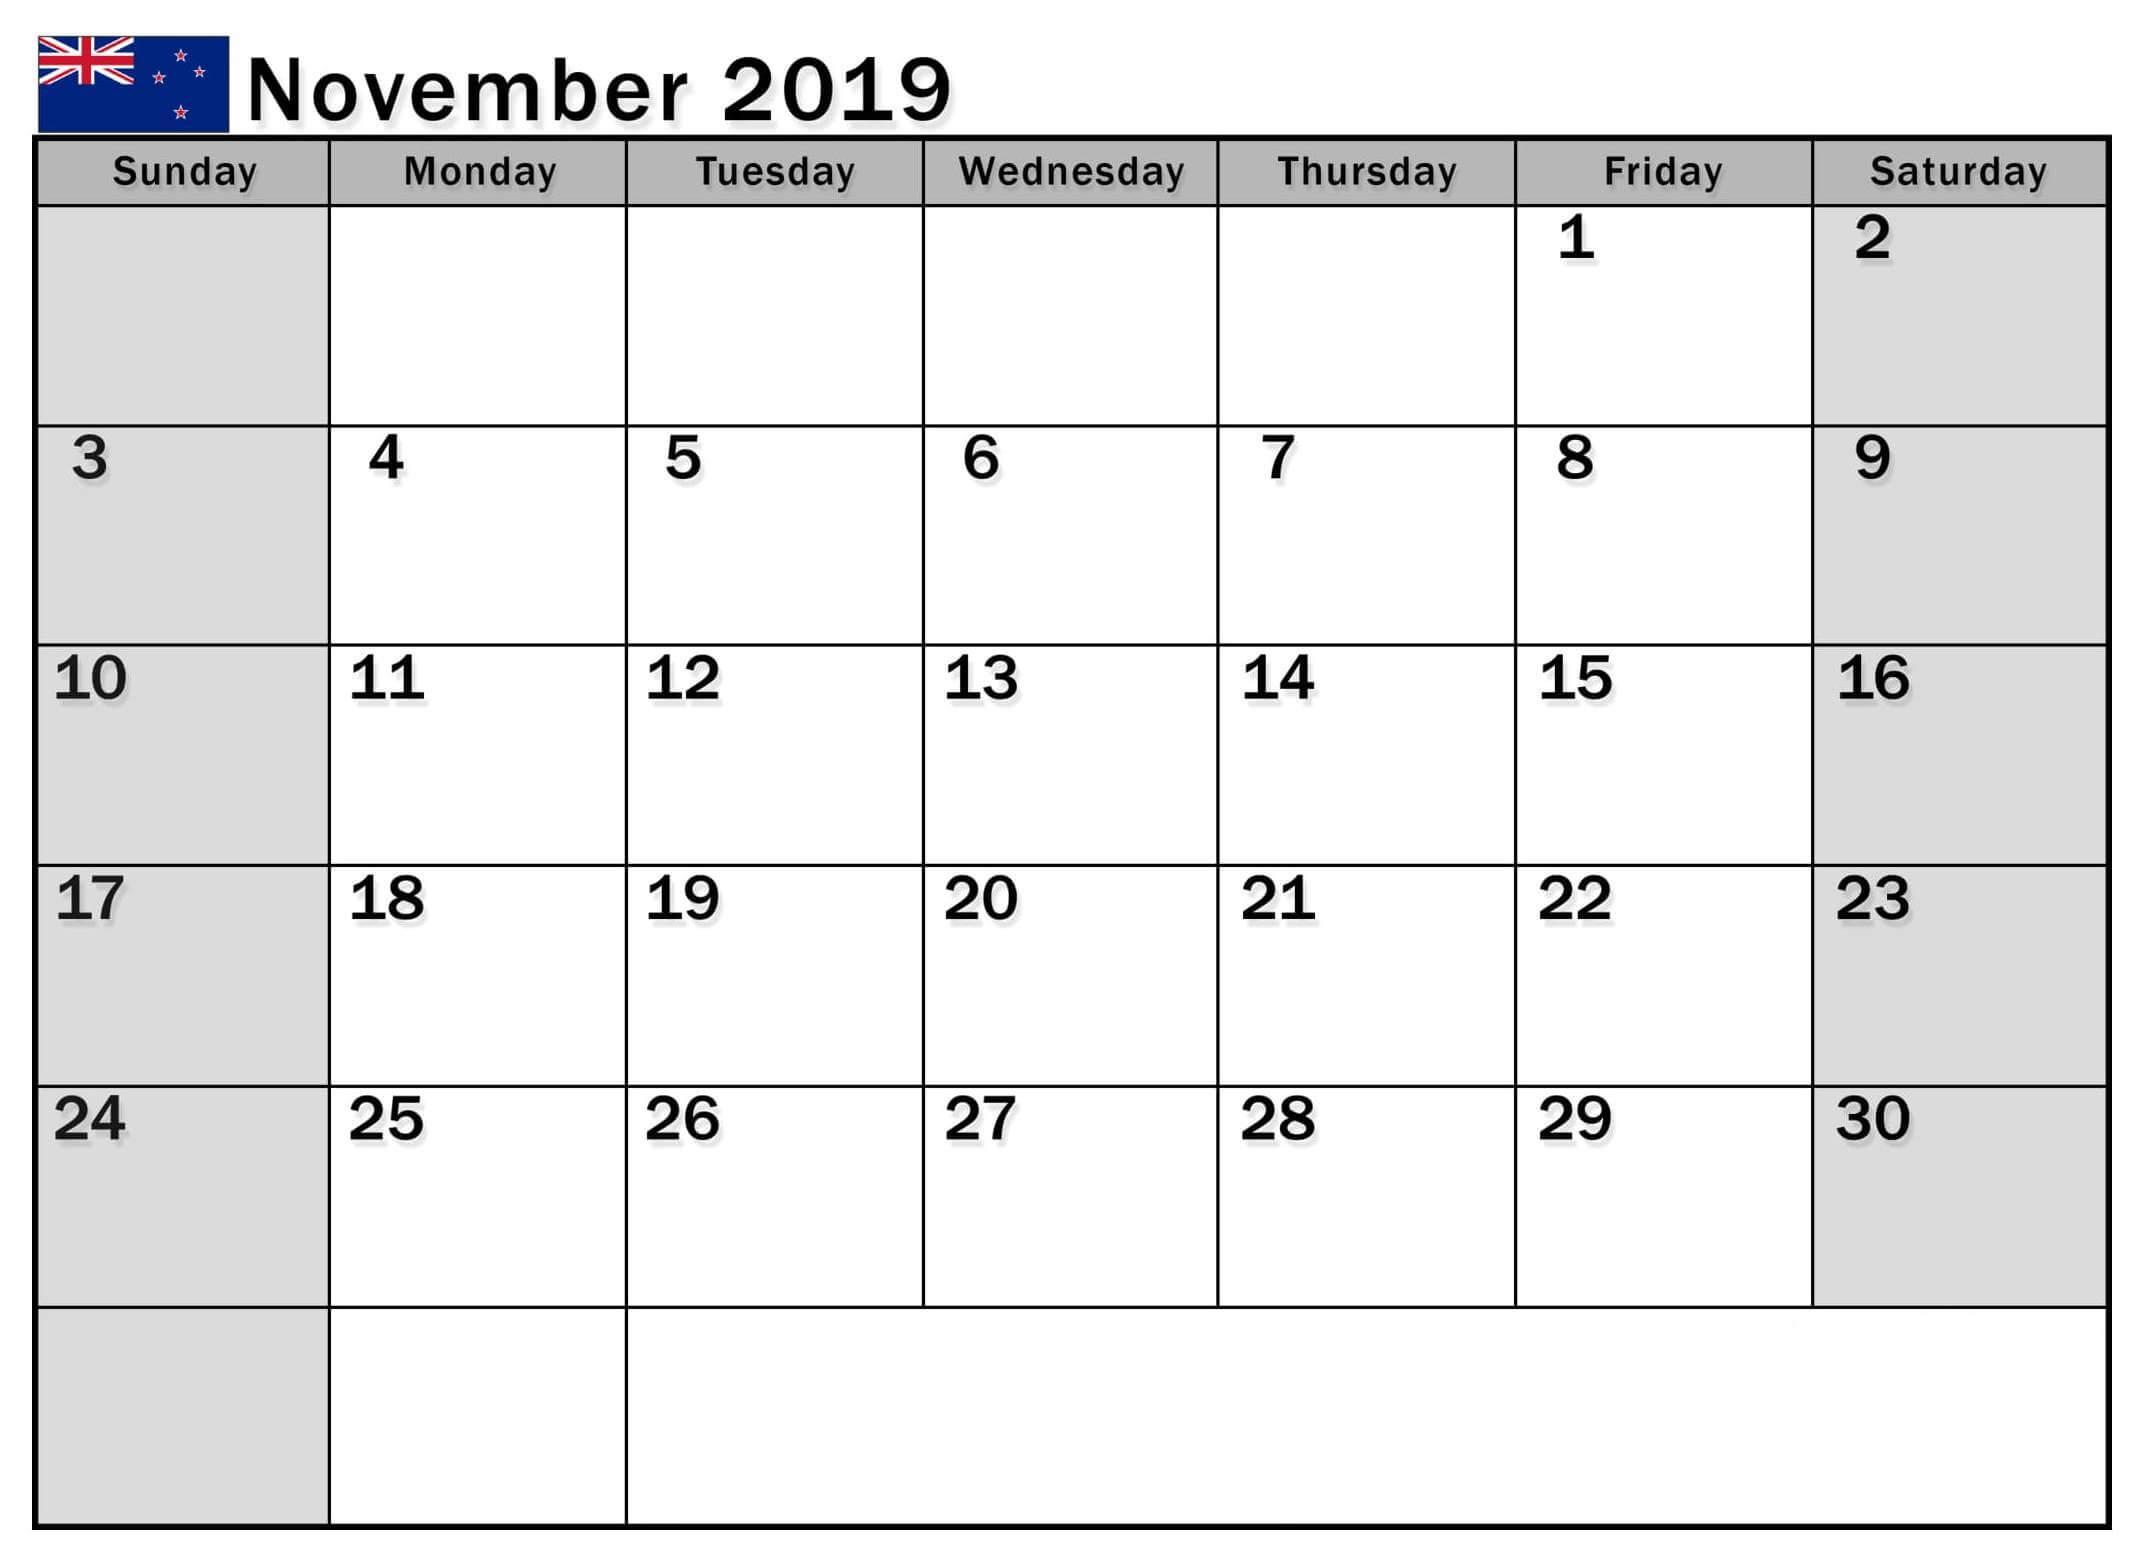 November 2019 Calendar Nz With National Holidays - 2019